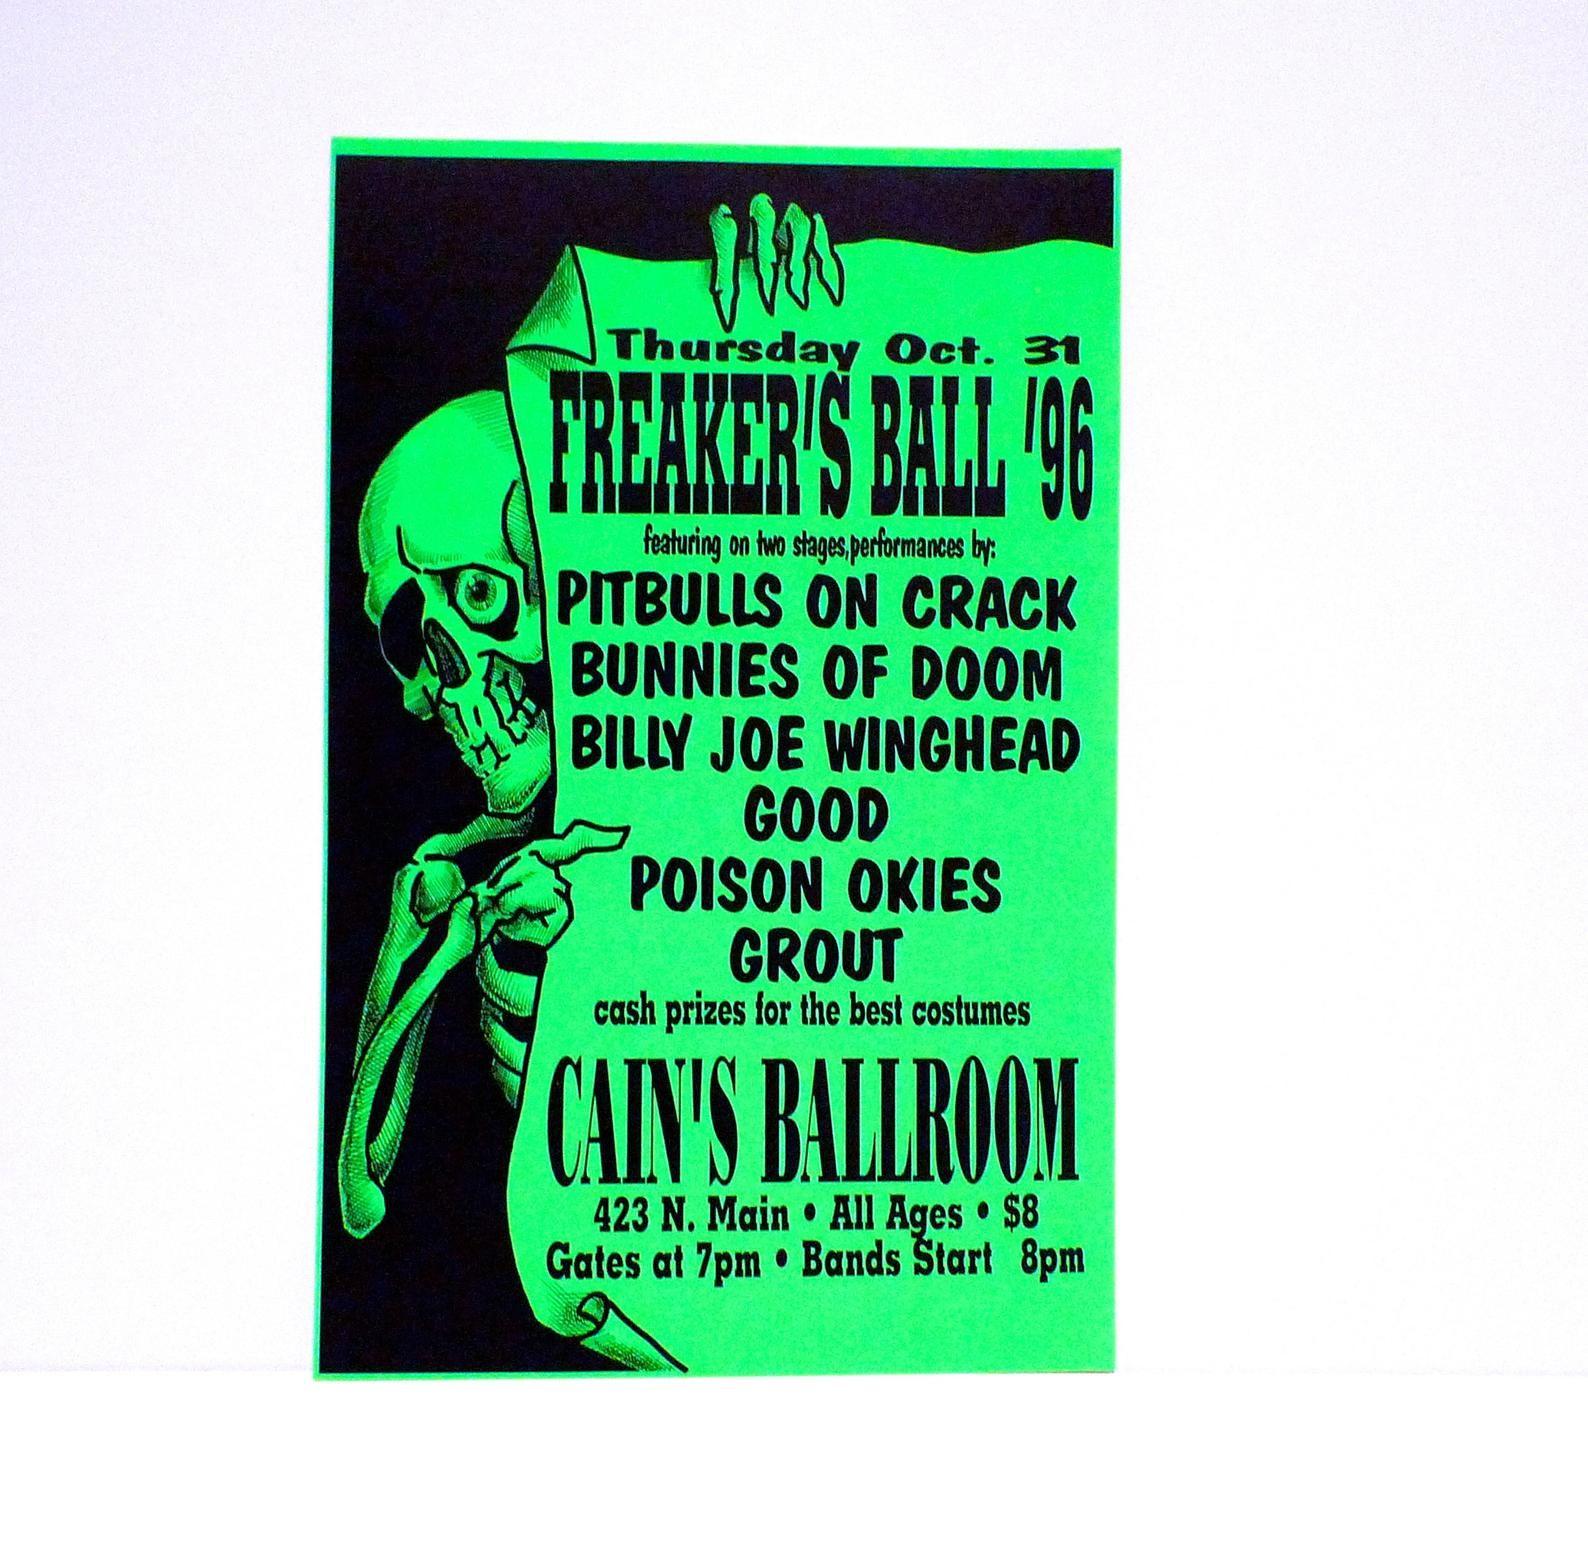 Halloween Parties Tulsa 2020 Freakers Ball Poster 1996 Concert Tour Vintage Cains Ballroom